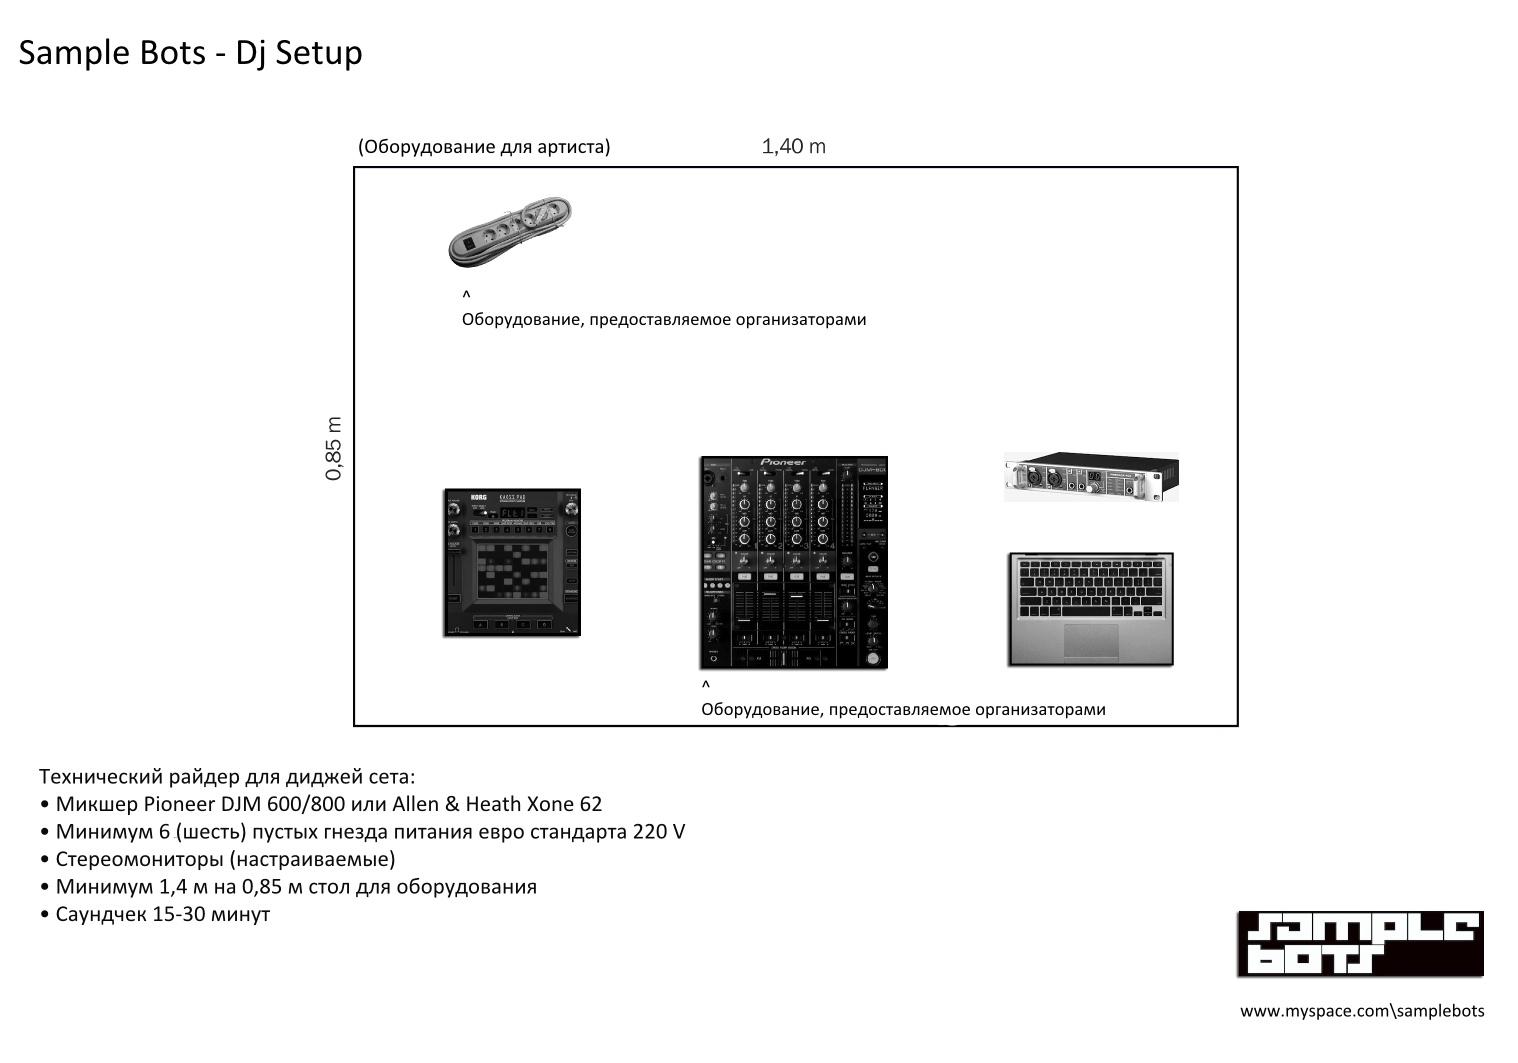 Sample bots sample bots dj setup tech rider rus 1706kb pronofoot35fo Image collections